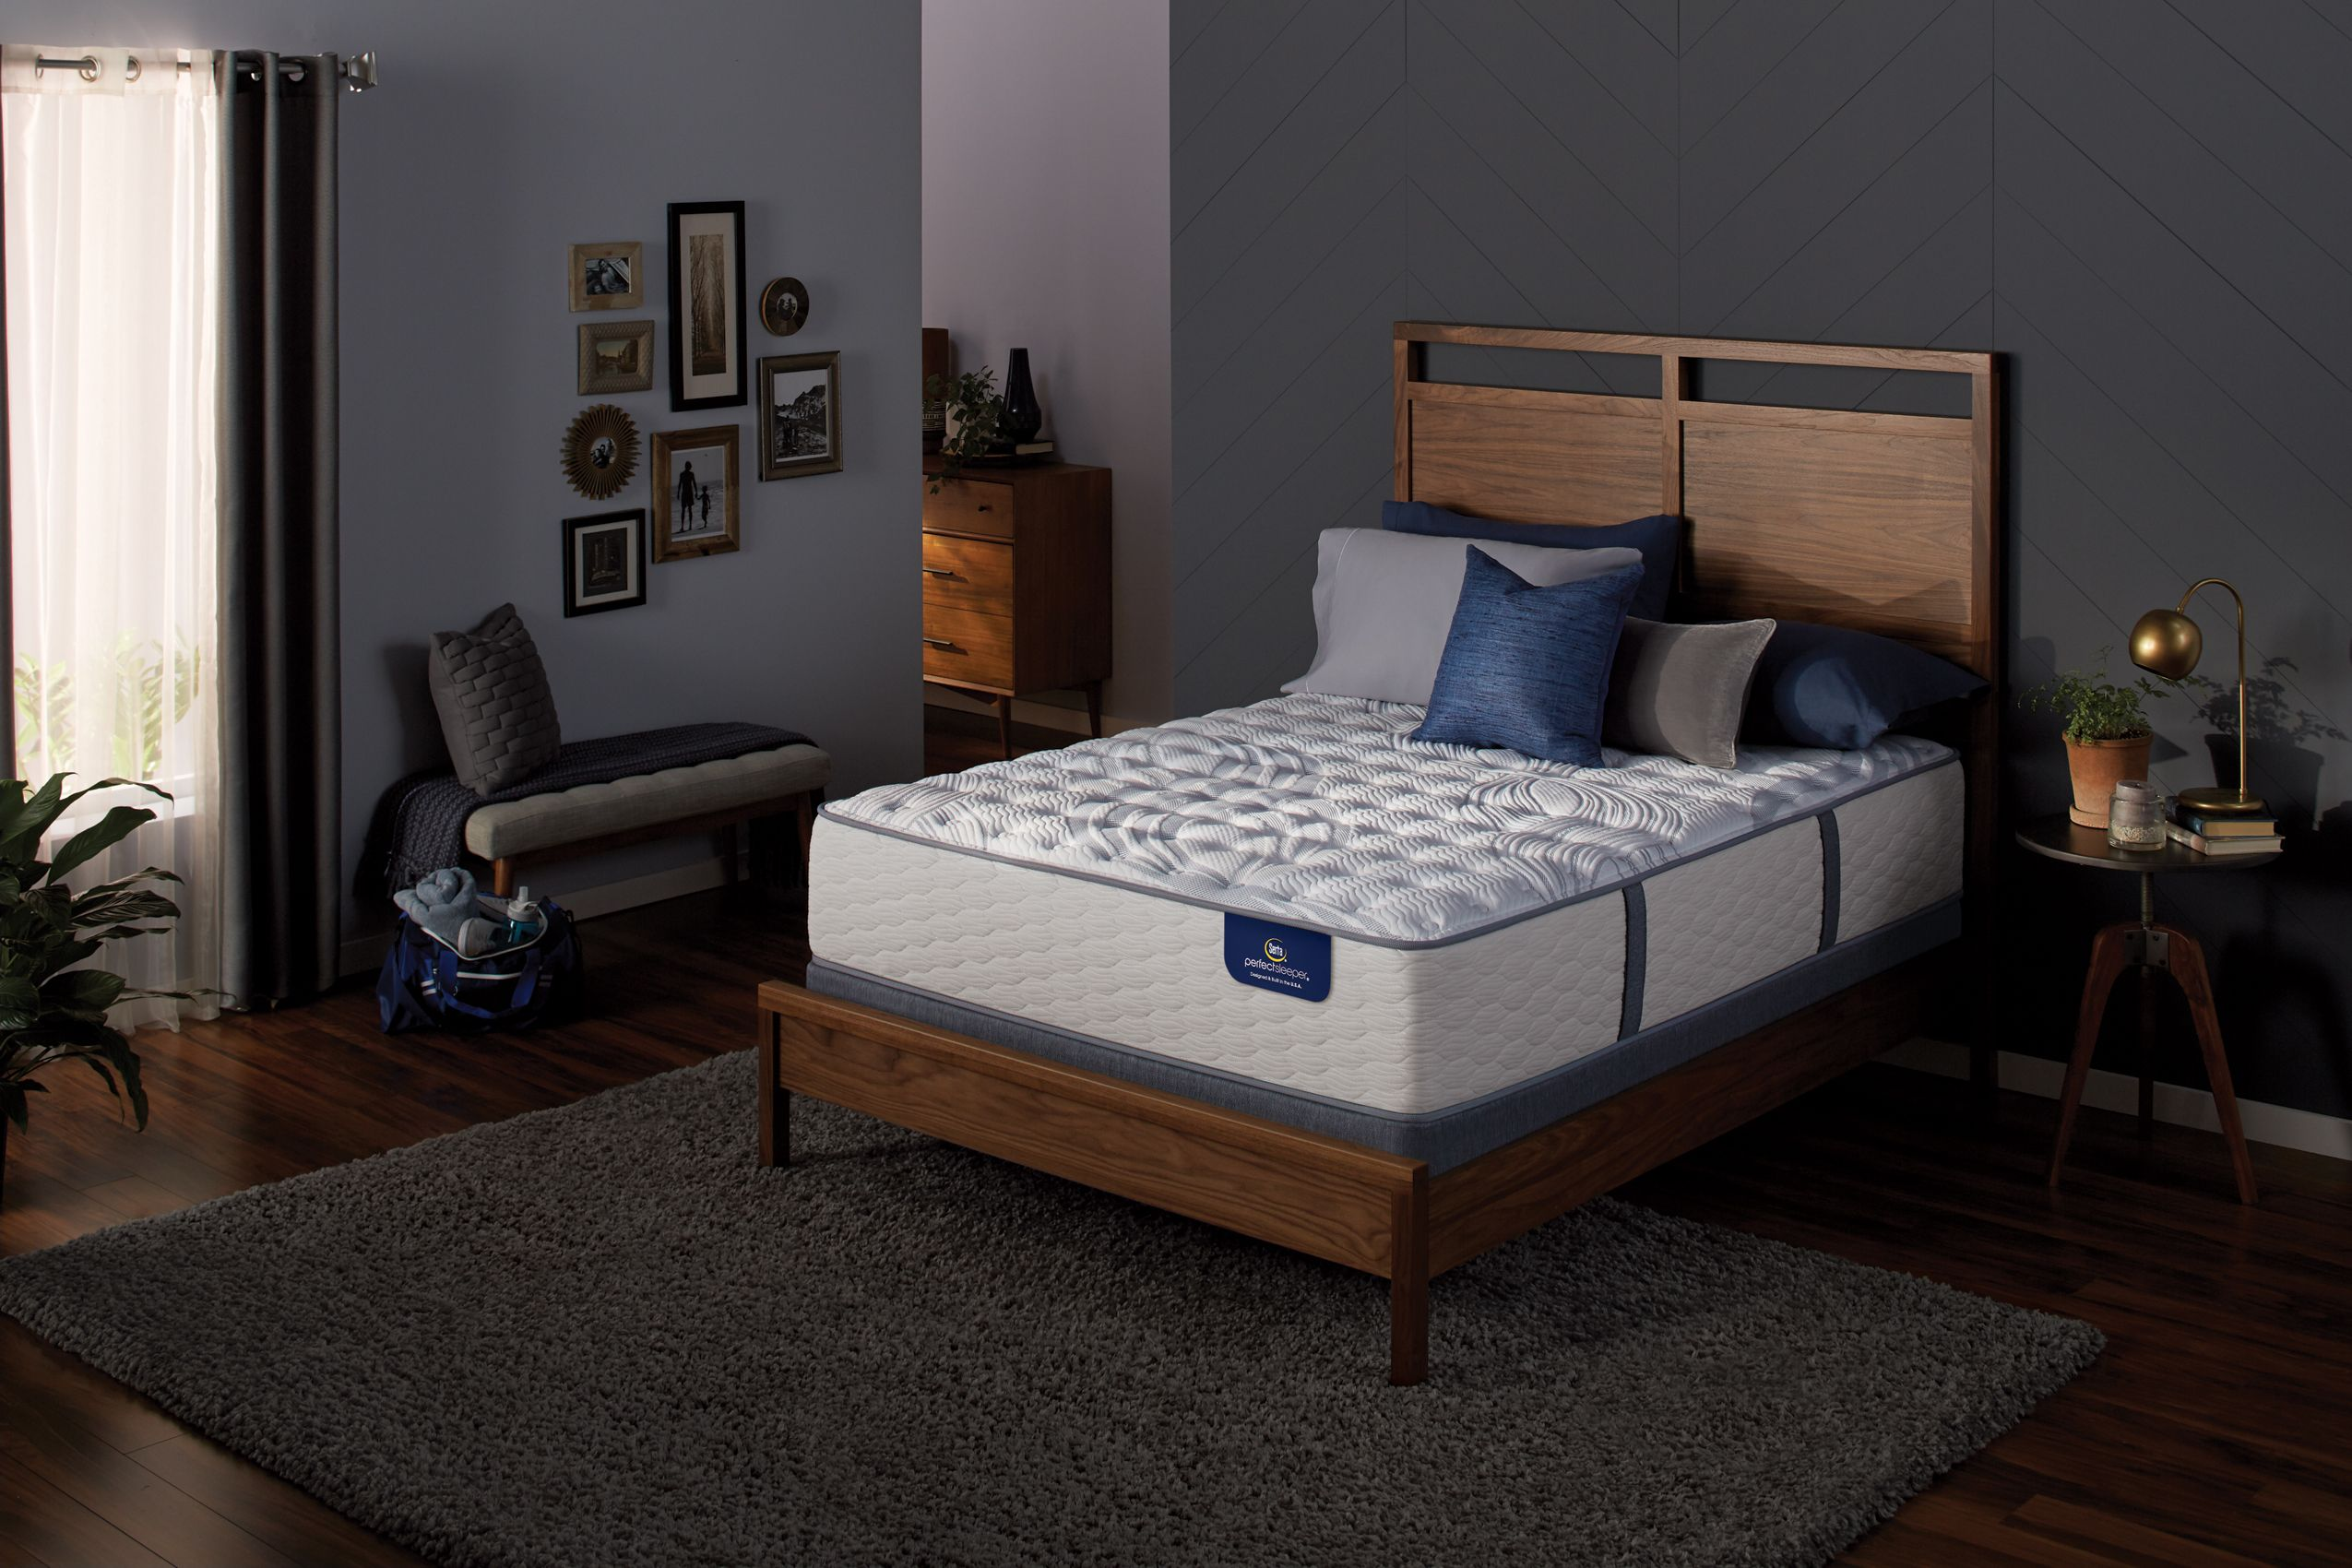 Serta Perfect Sleeper Haddonfield Luxury Firm Set Plush